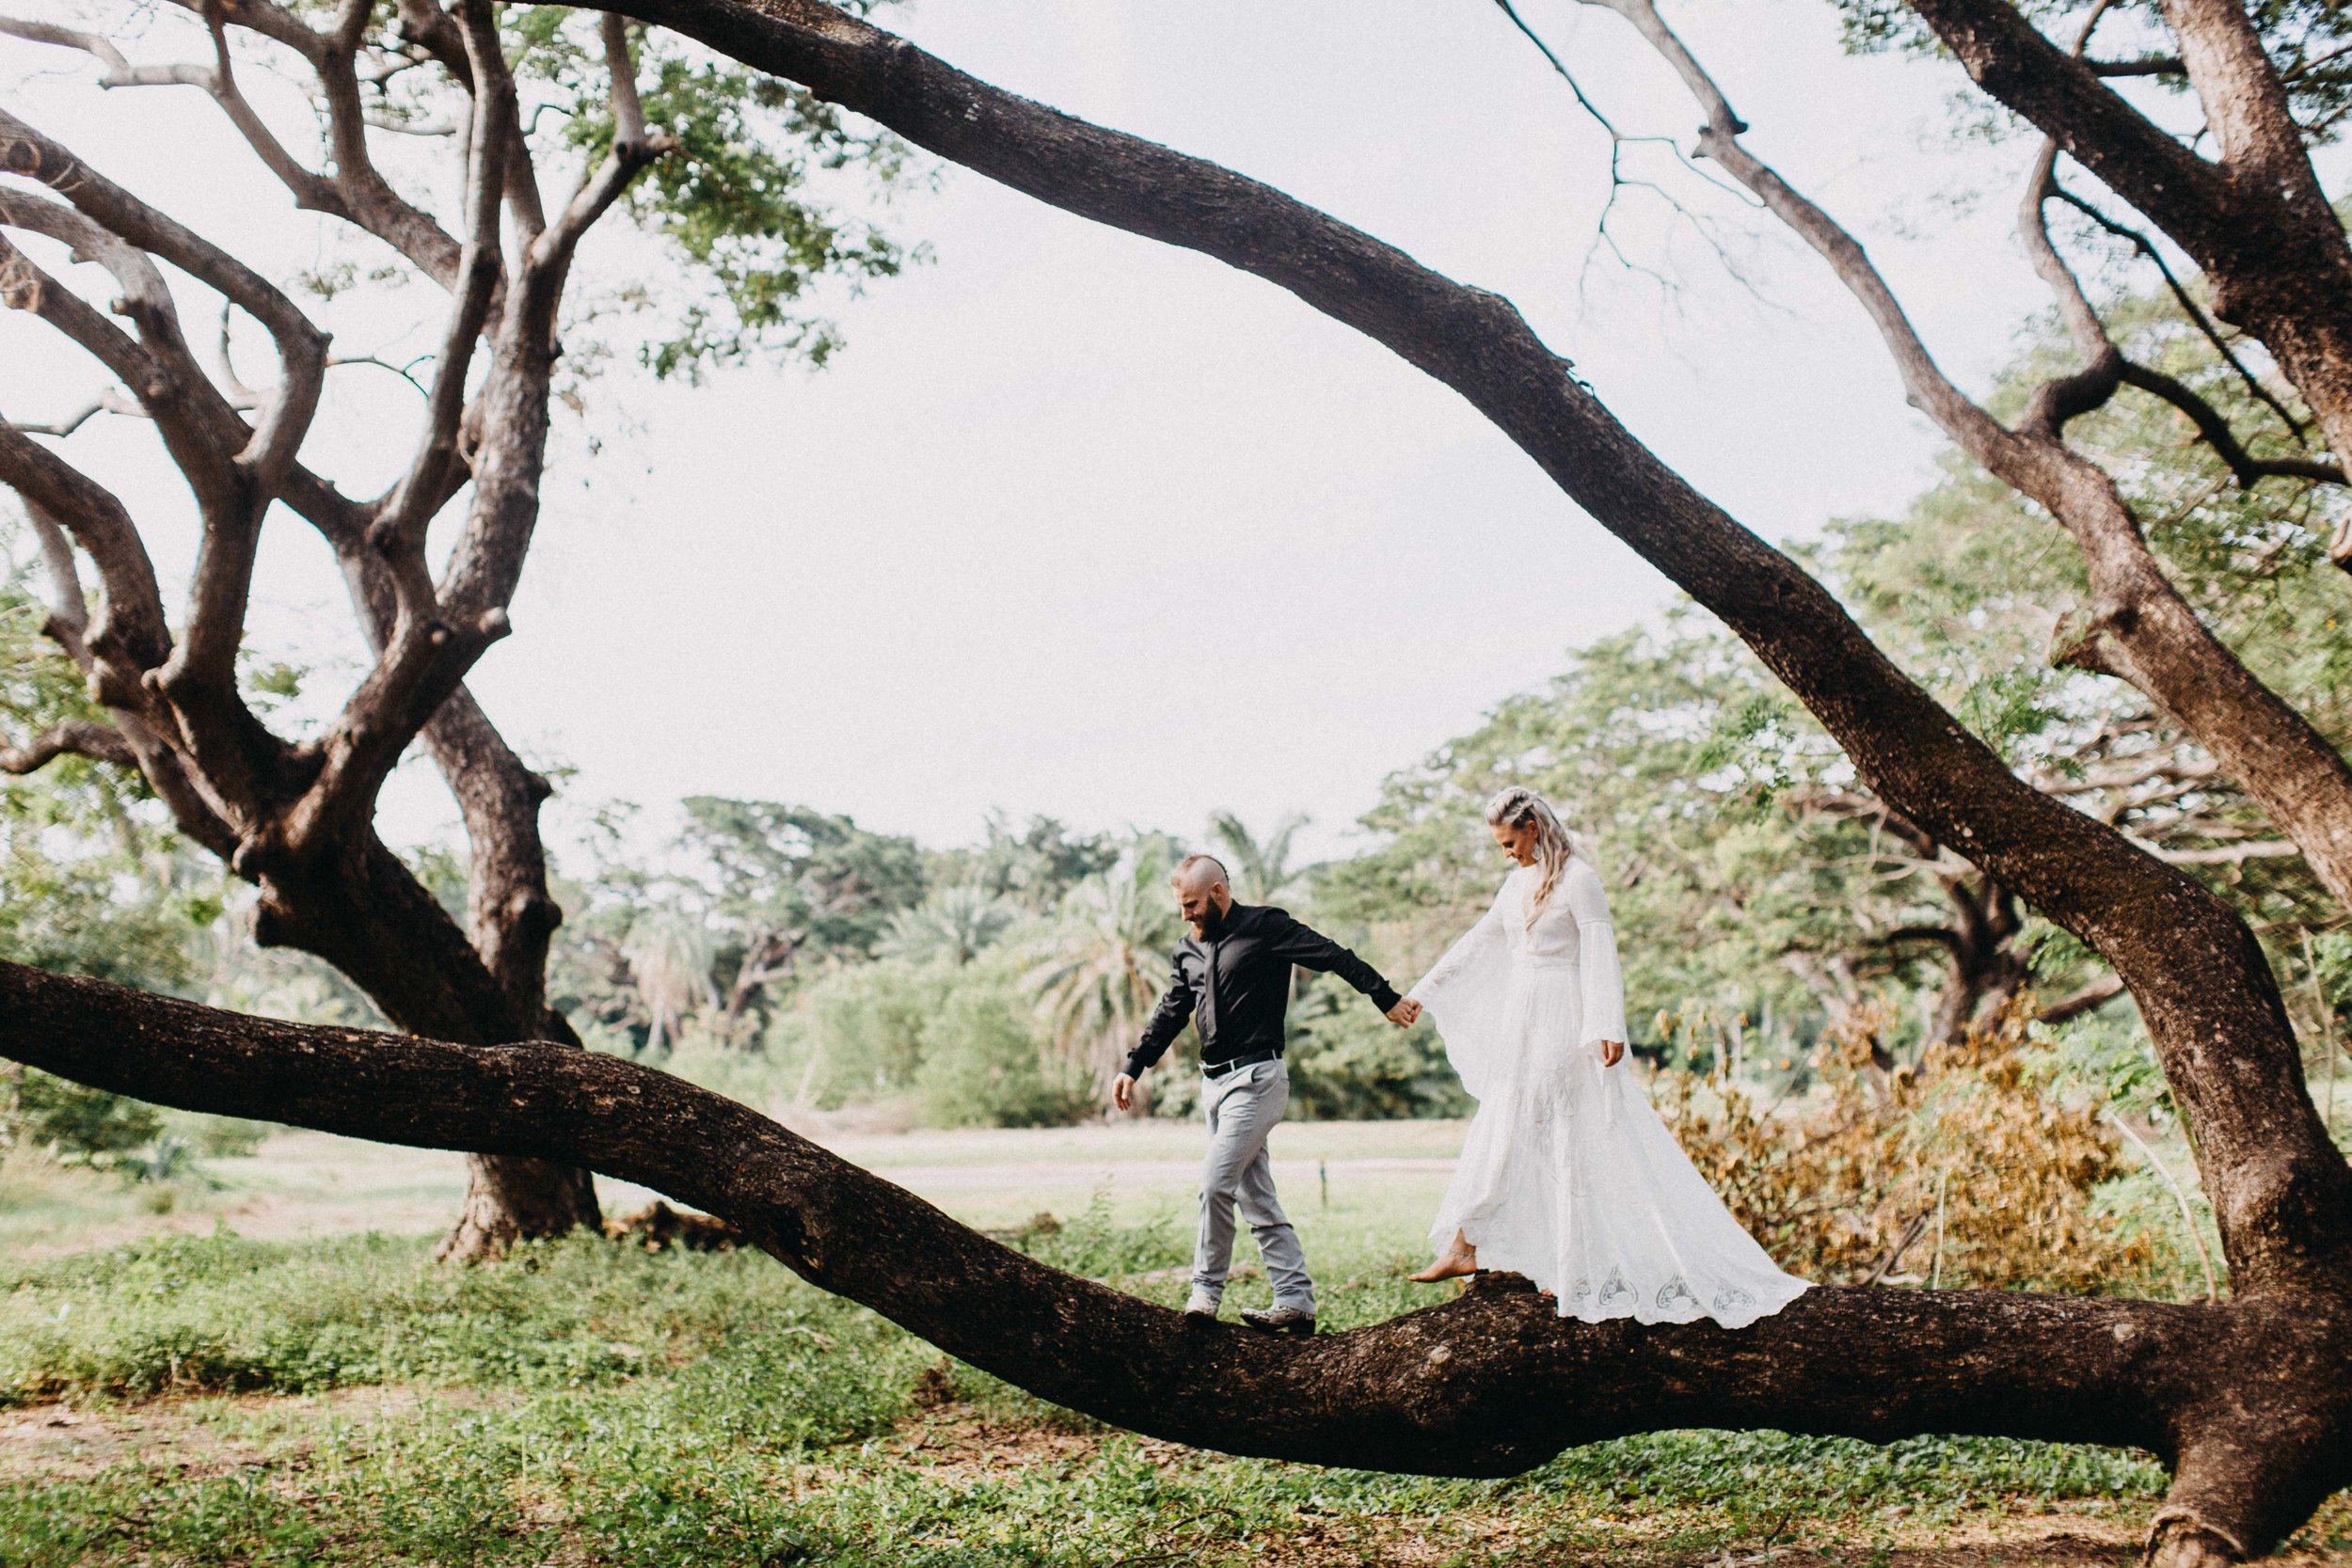 darwin-elopement-wedding-beach-camden-photography-www.emilyobrienphotography.net-36.jpg